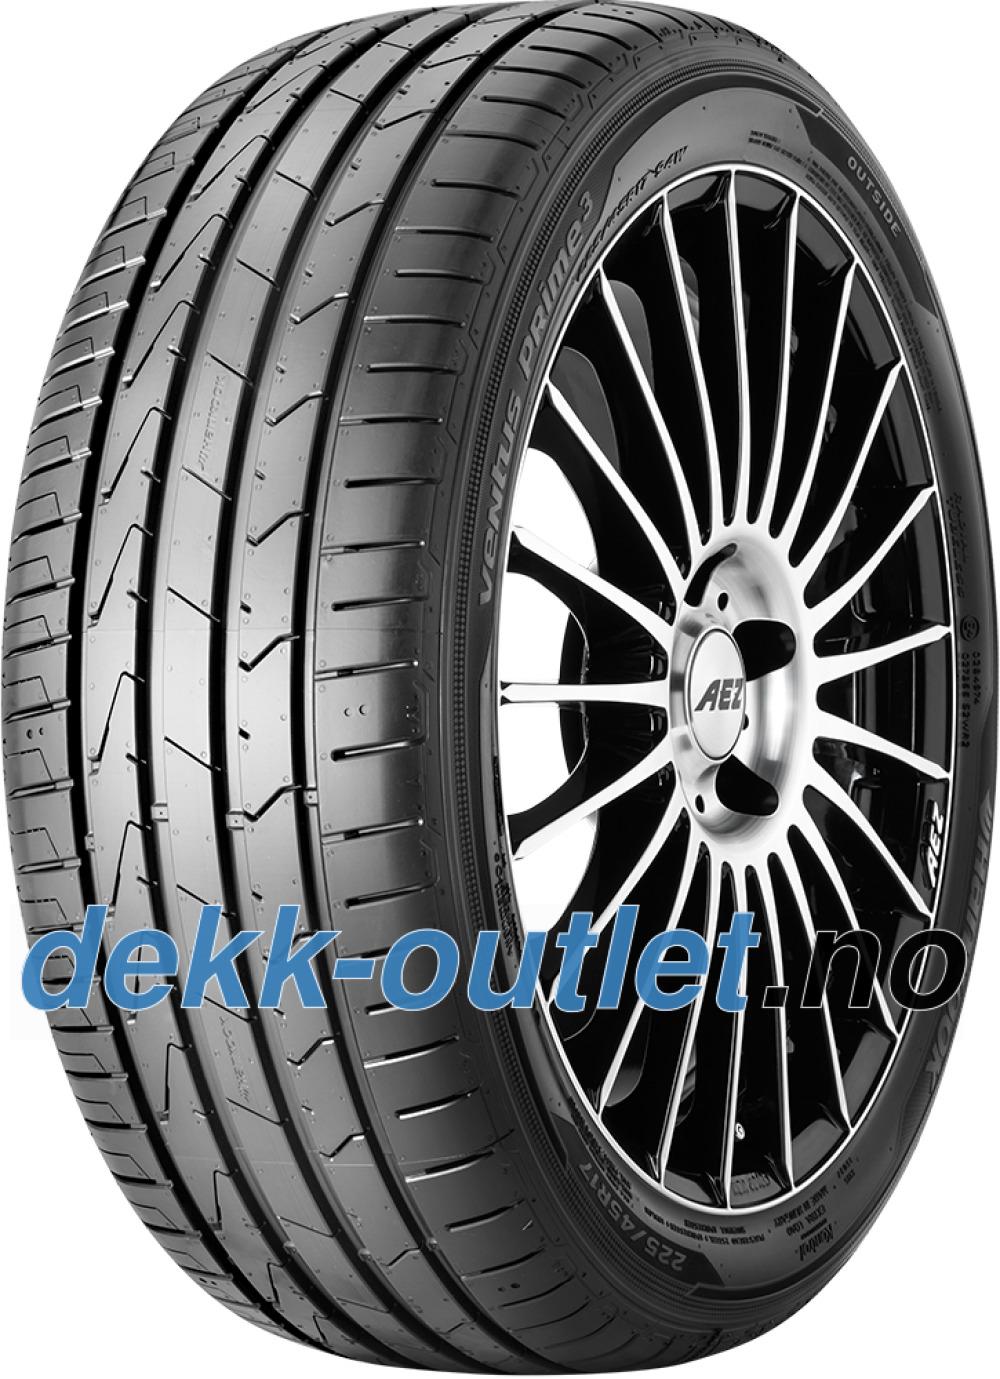 Hankook Ventus Prime 3 K125 ( 195/65 R15 91H SBL )